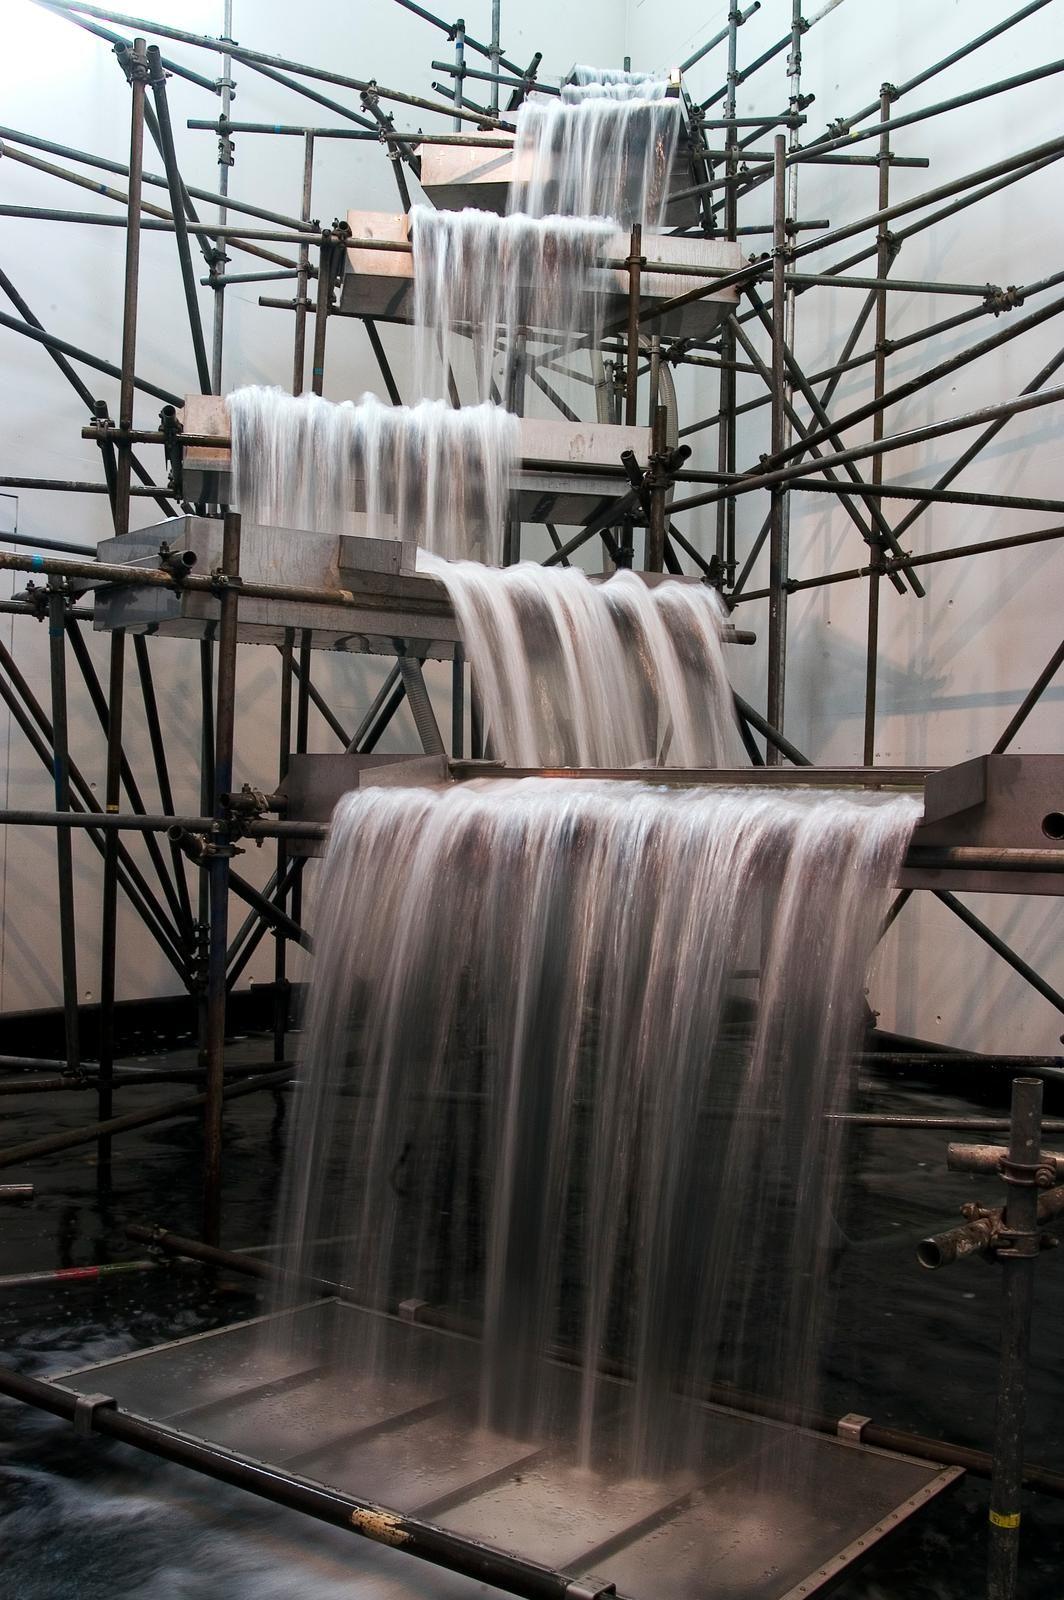 Waterfall • Artwork • Studio Olafur Eliasson